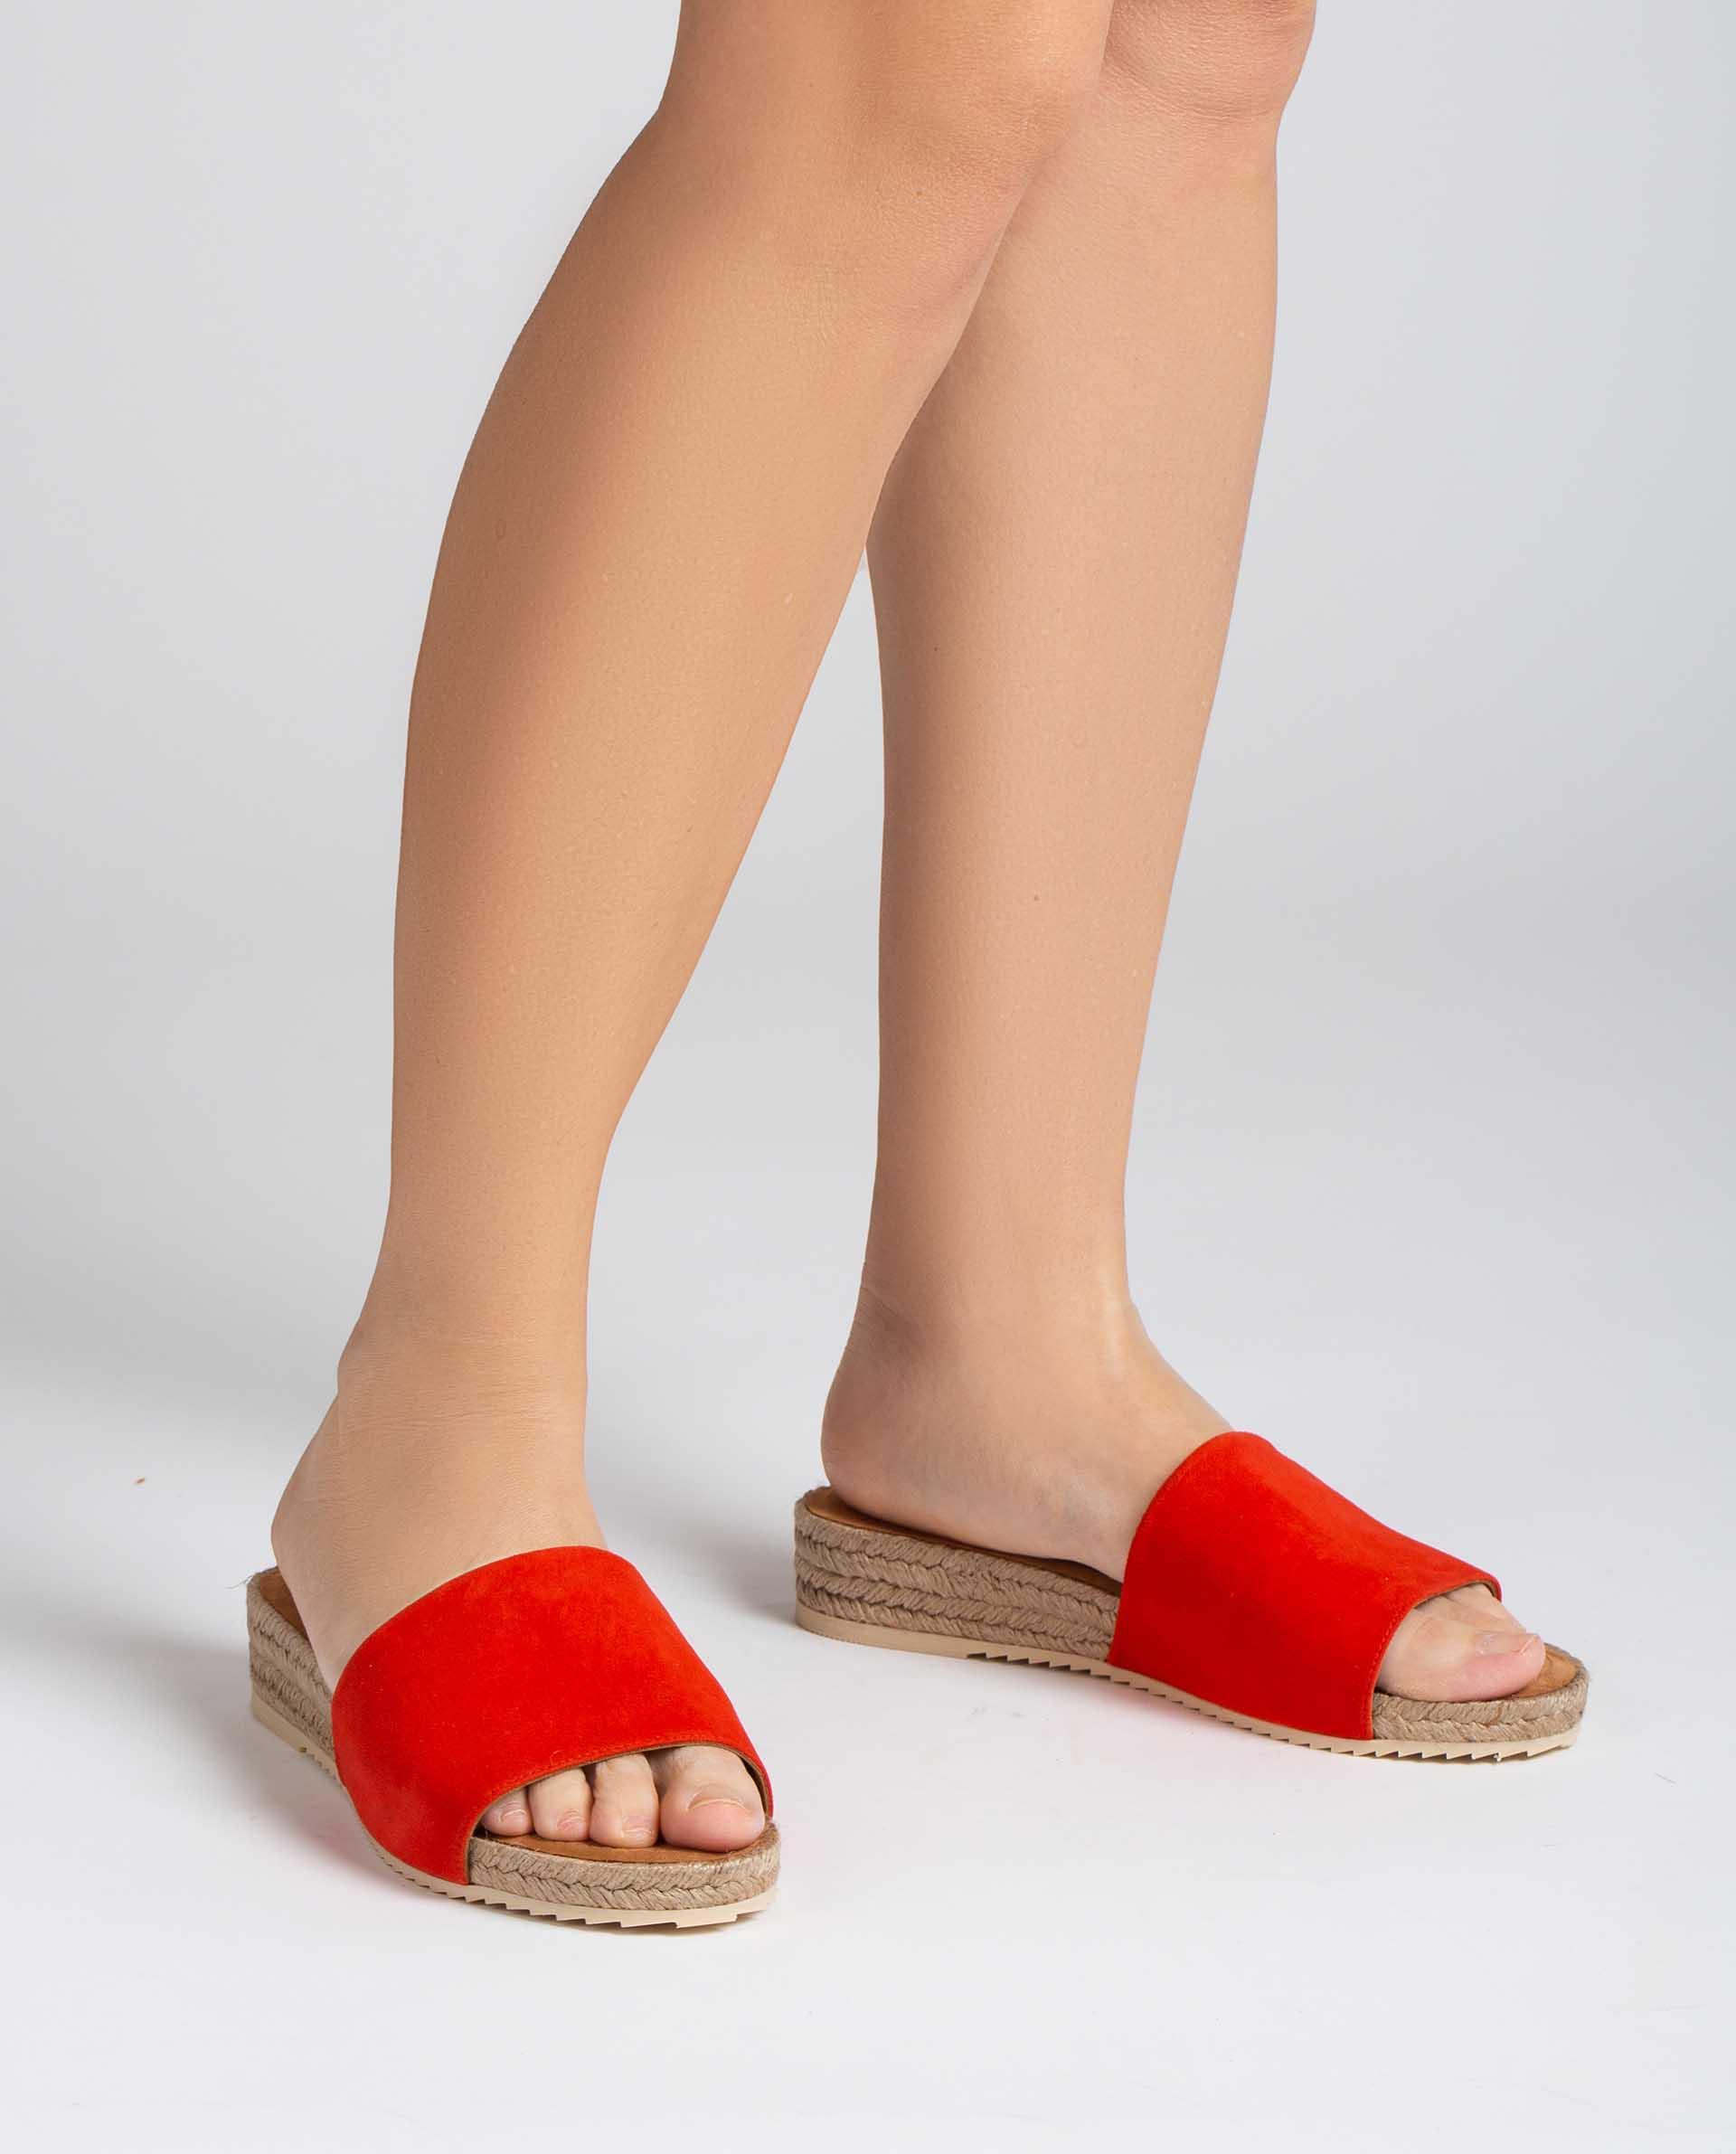 Unisa Zapatos de Mujer BATZANSIN_KS corallo